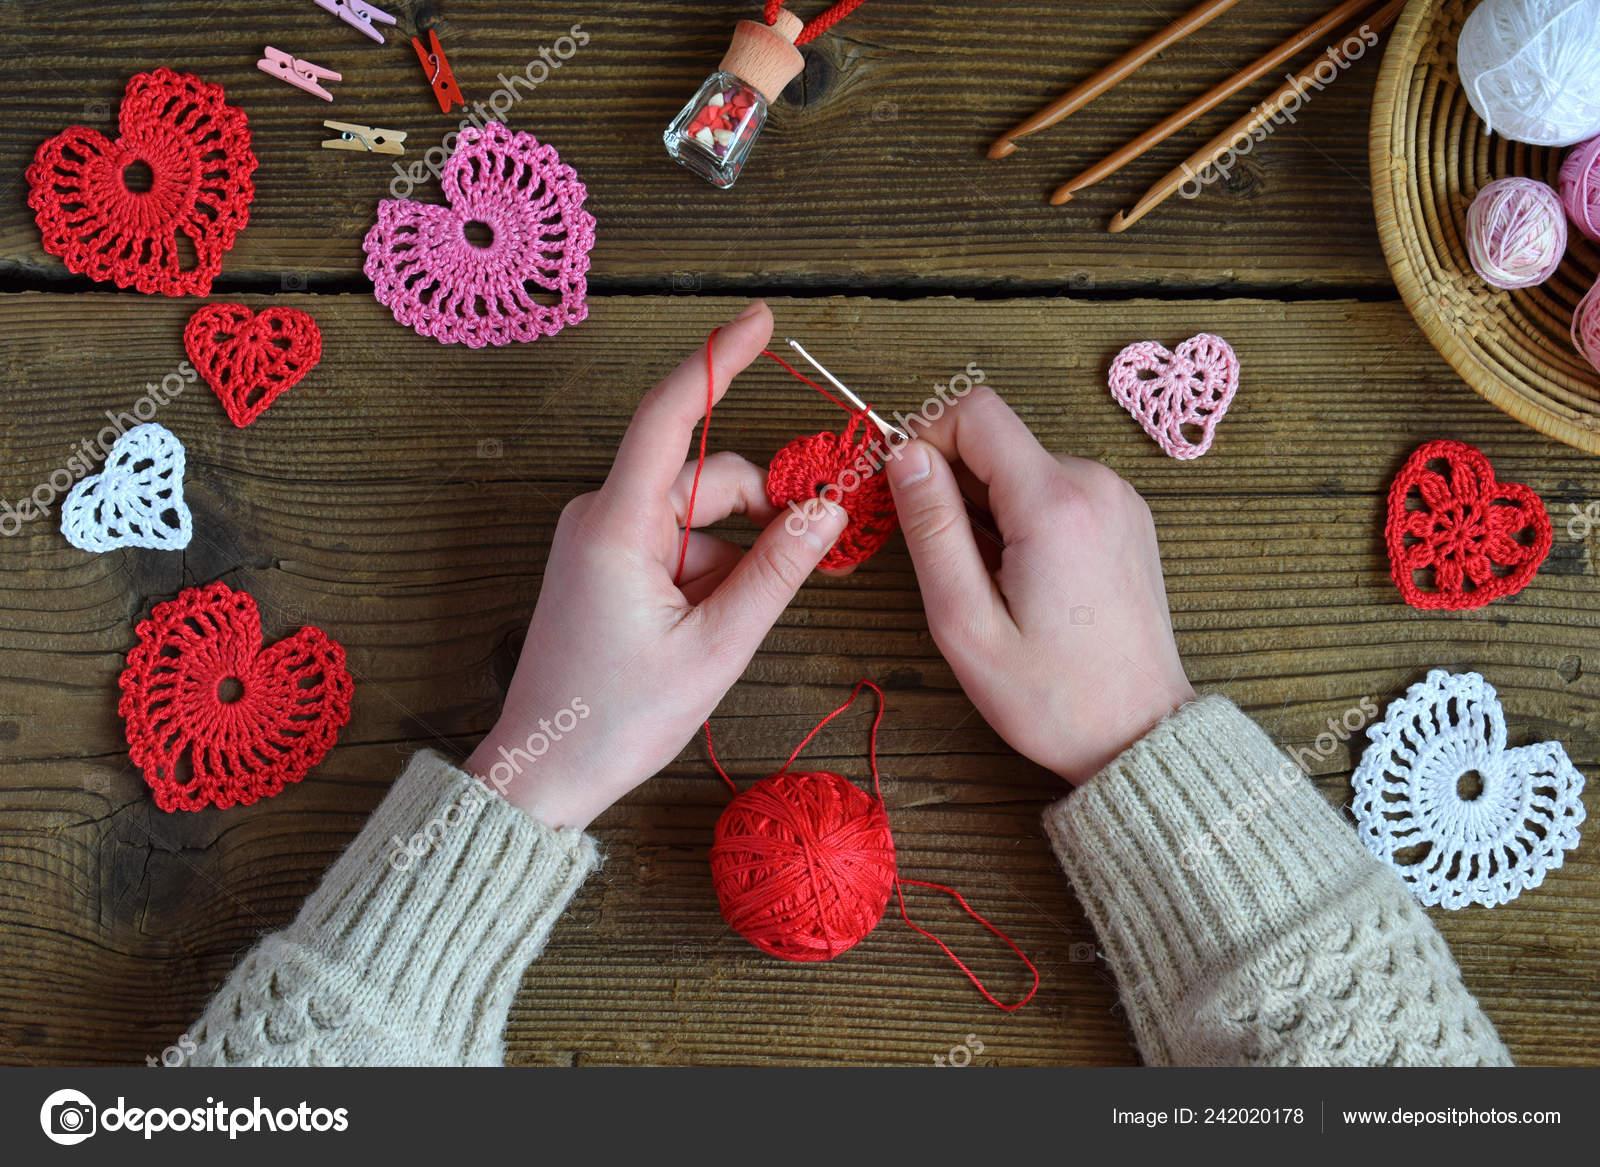 Bamboo Knitting Needles Hobbies Art and Craft Crocheting Knit Sew Christmas Gift